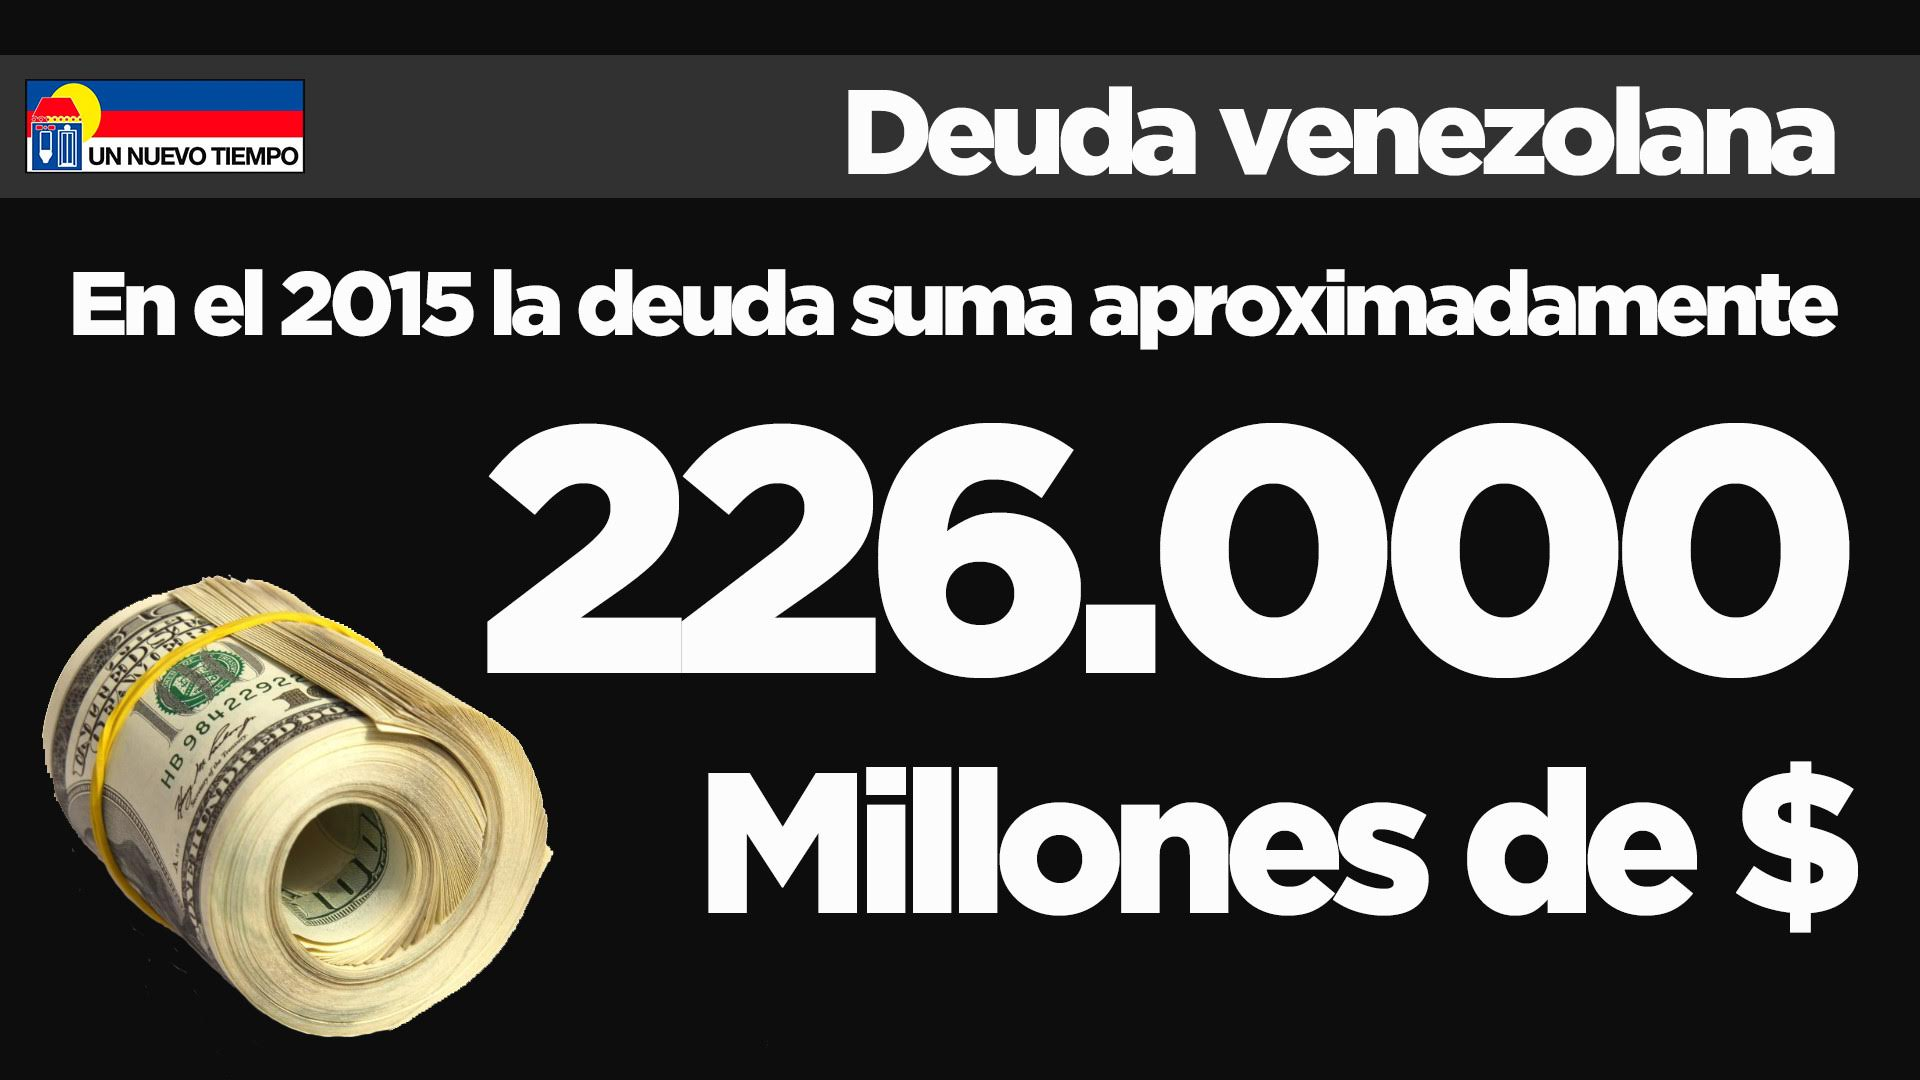 deuda-total-venezuela-elias-matta